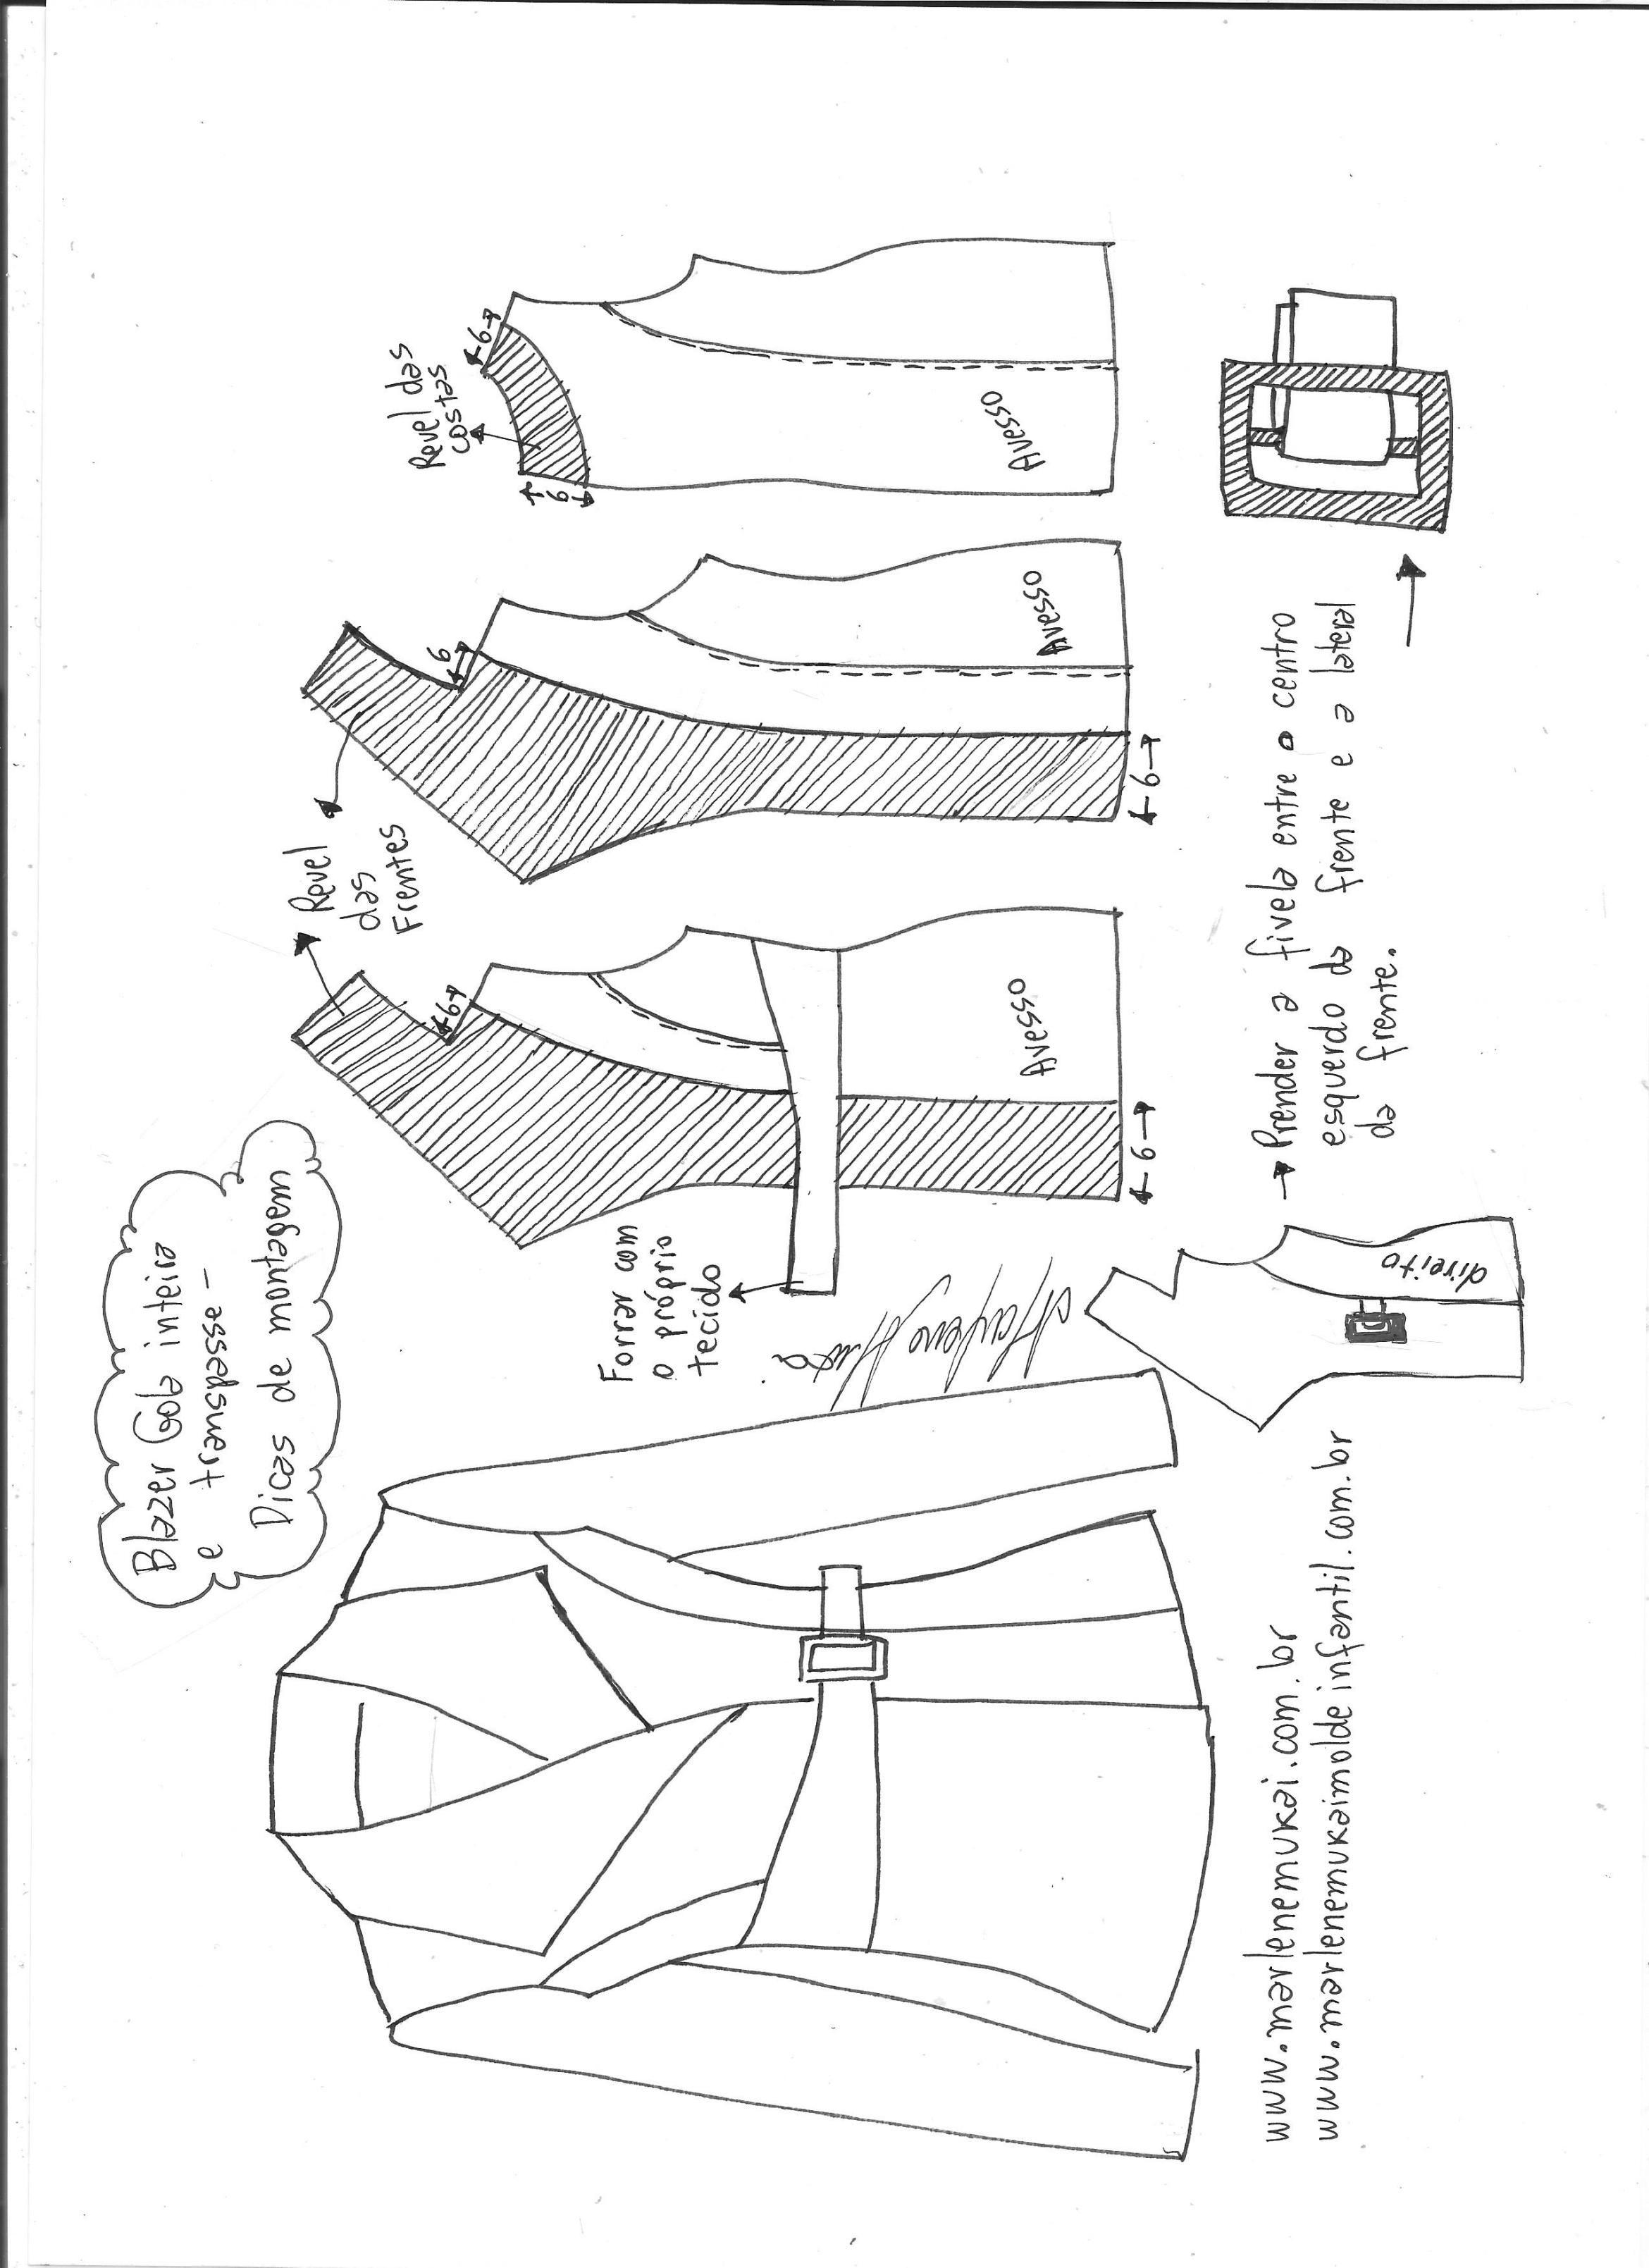 Blazer gola inteira com transpasse | Patrones | Pinterest | Sewing ...